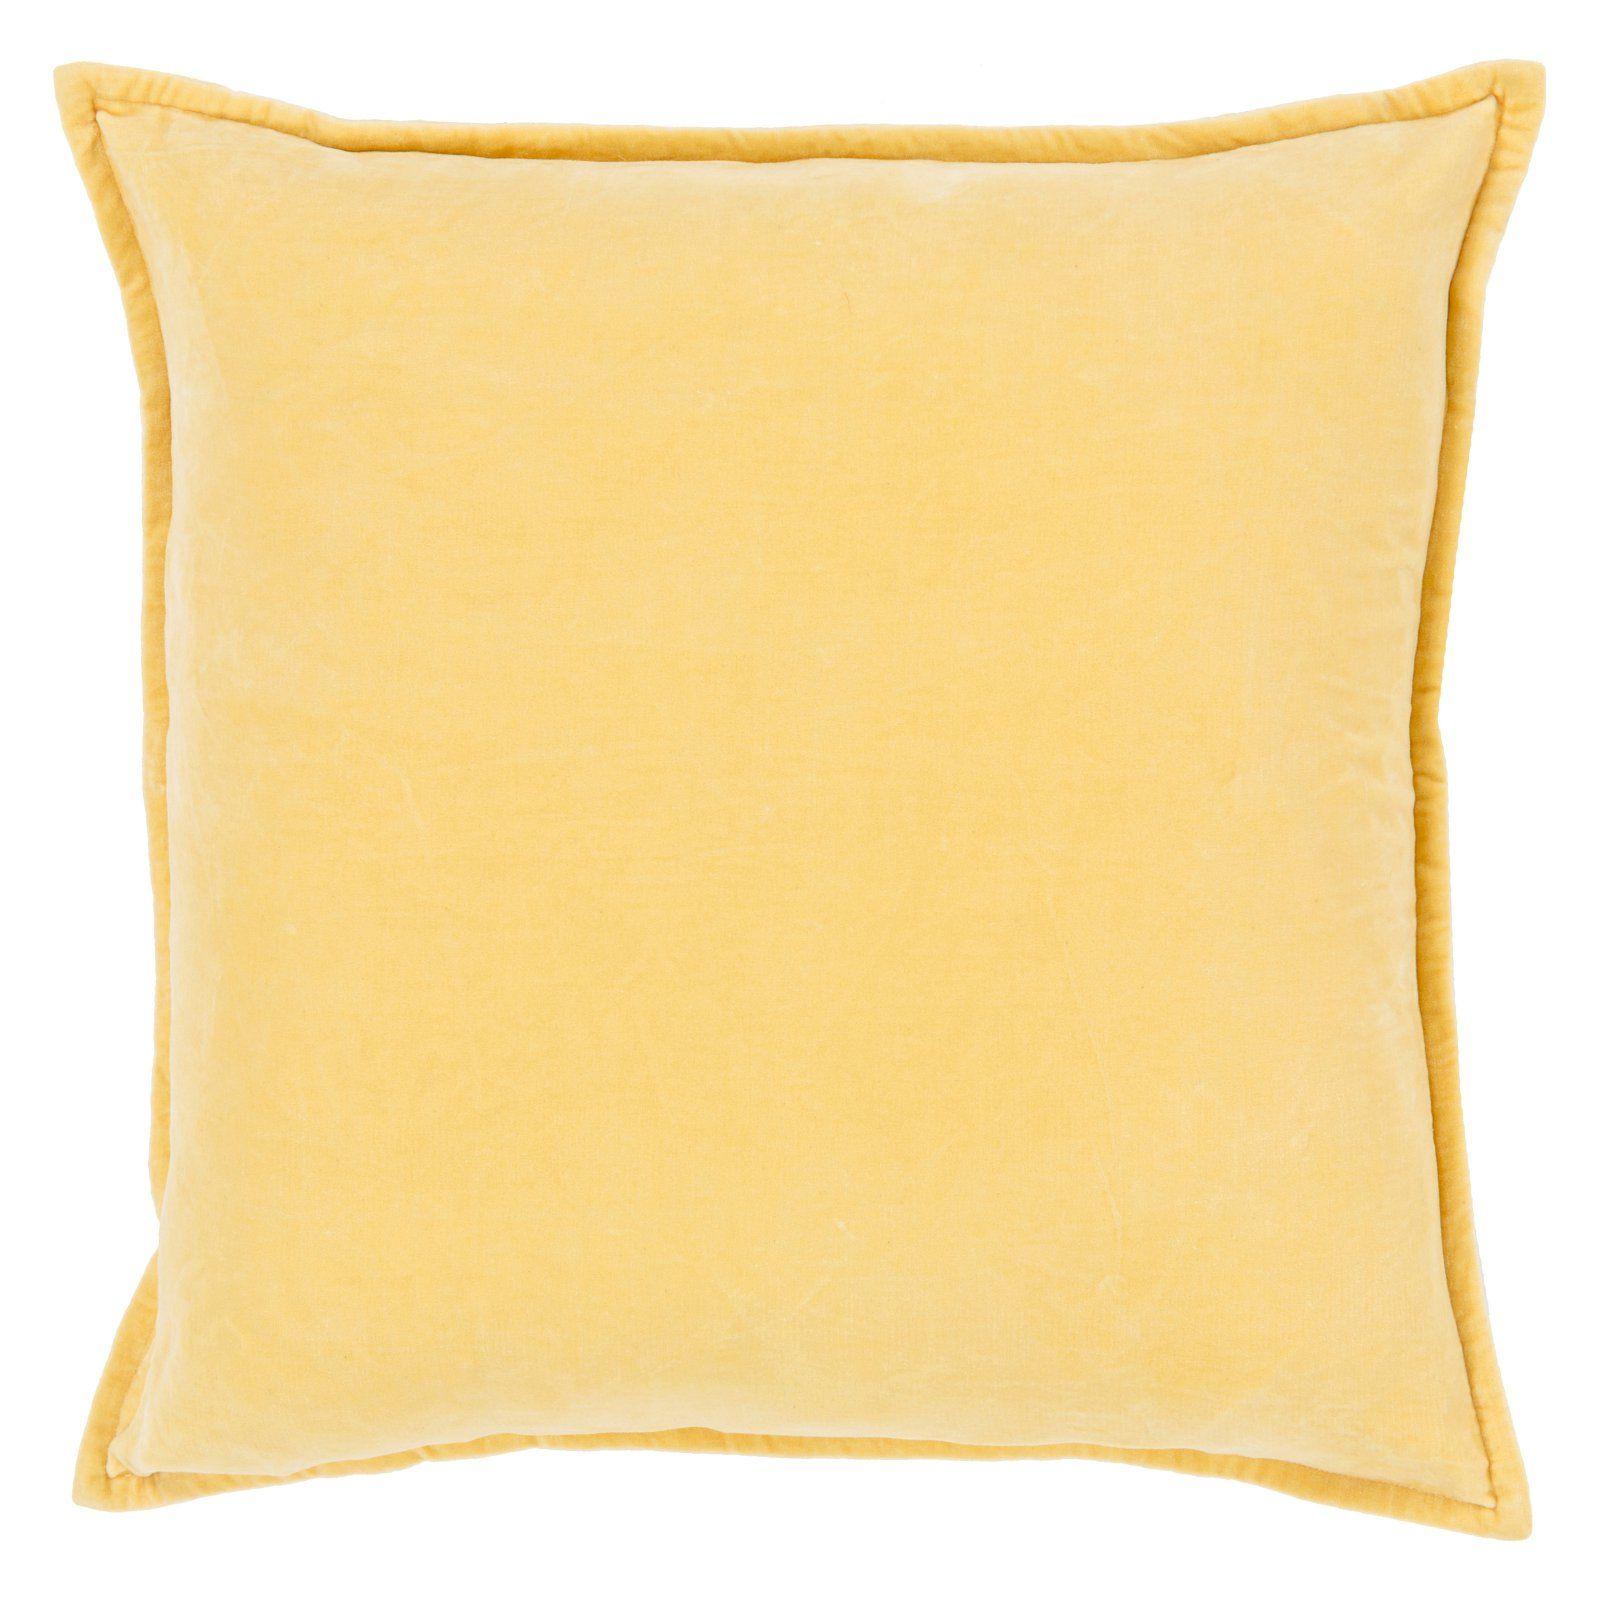 Surya Smooth Velvet Decorative Throw Pillow Lime Green